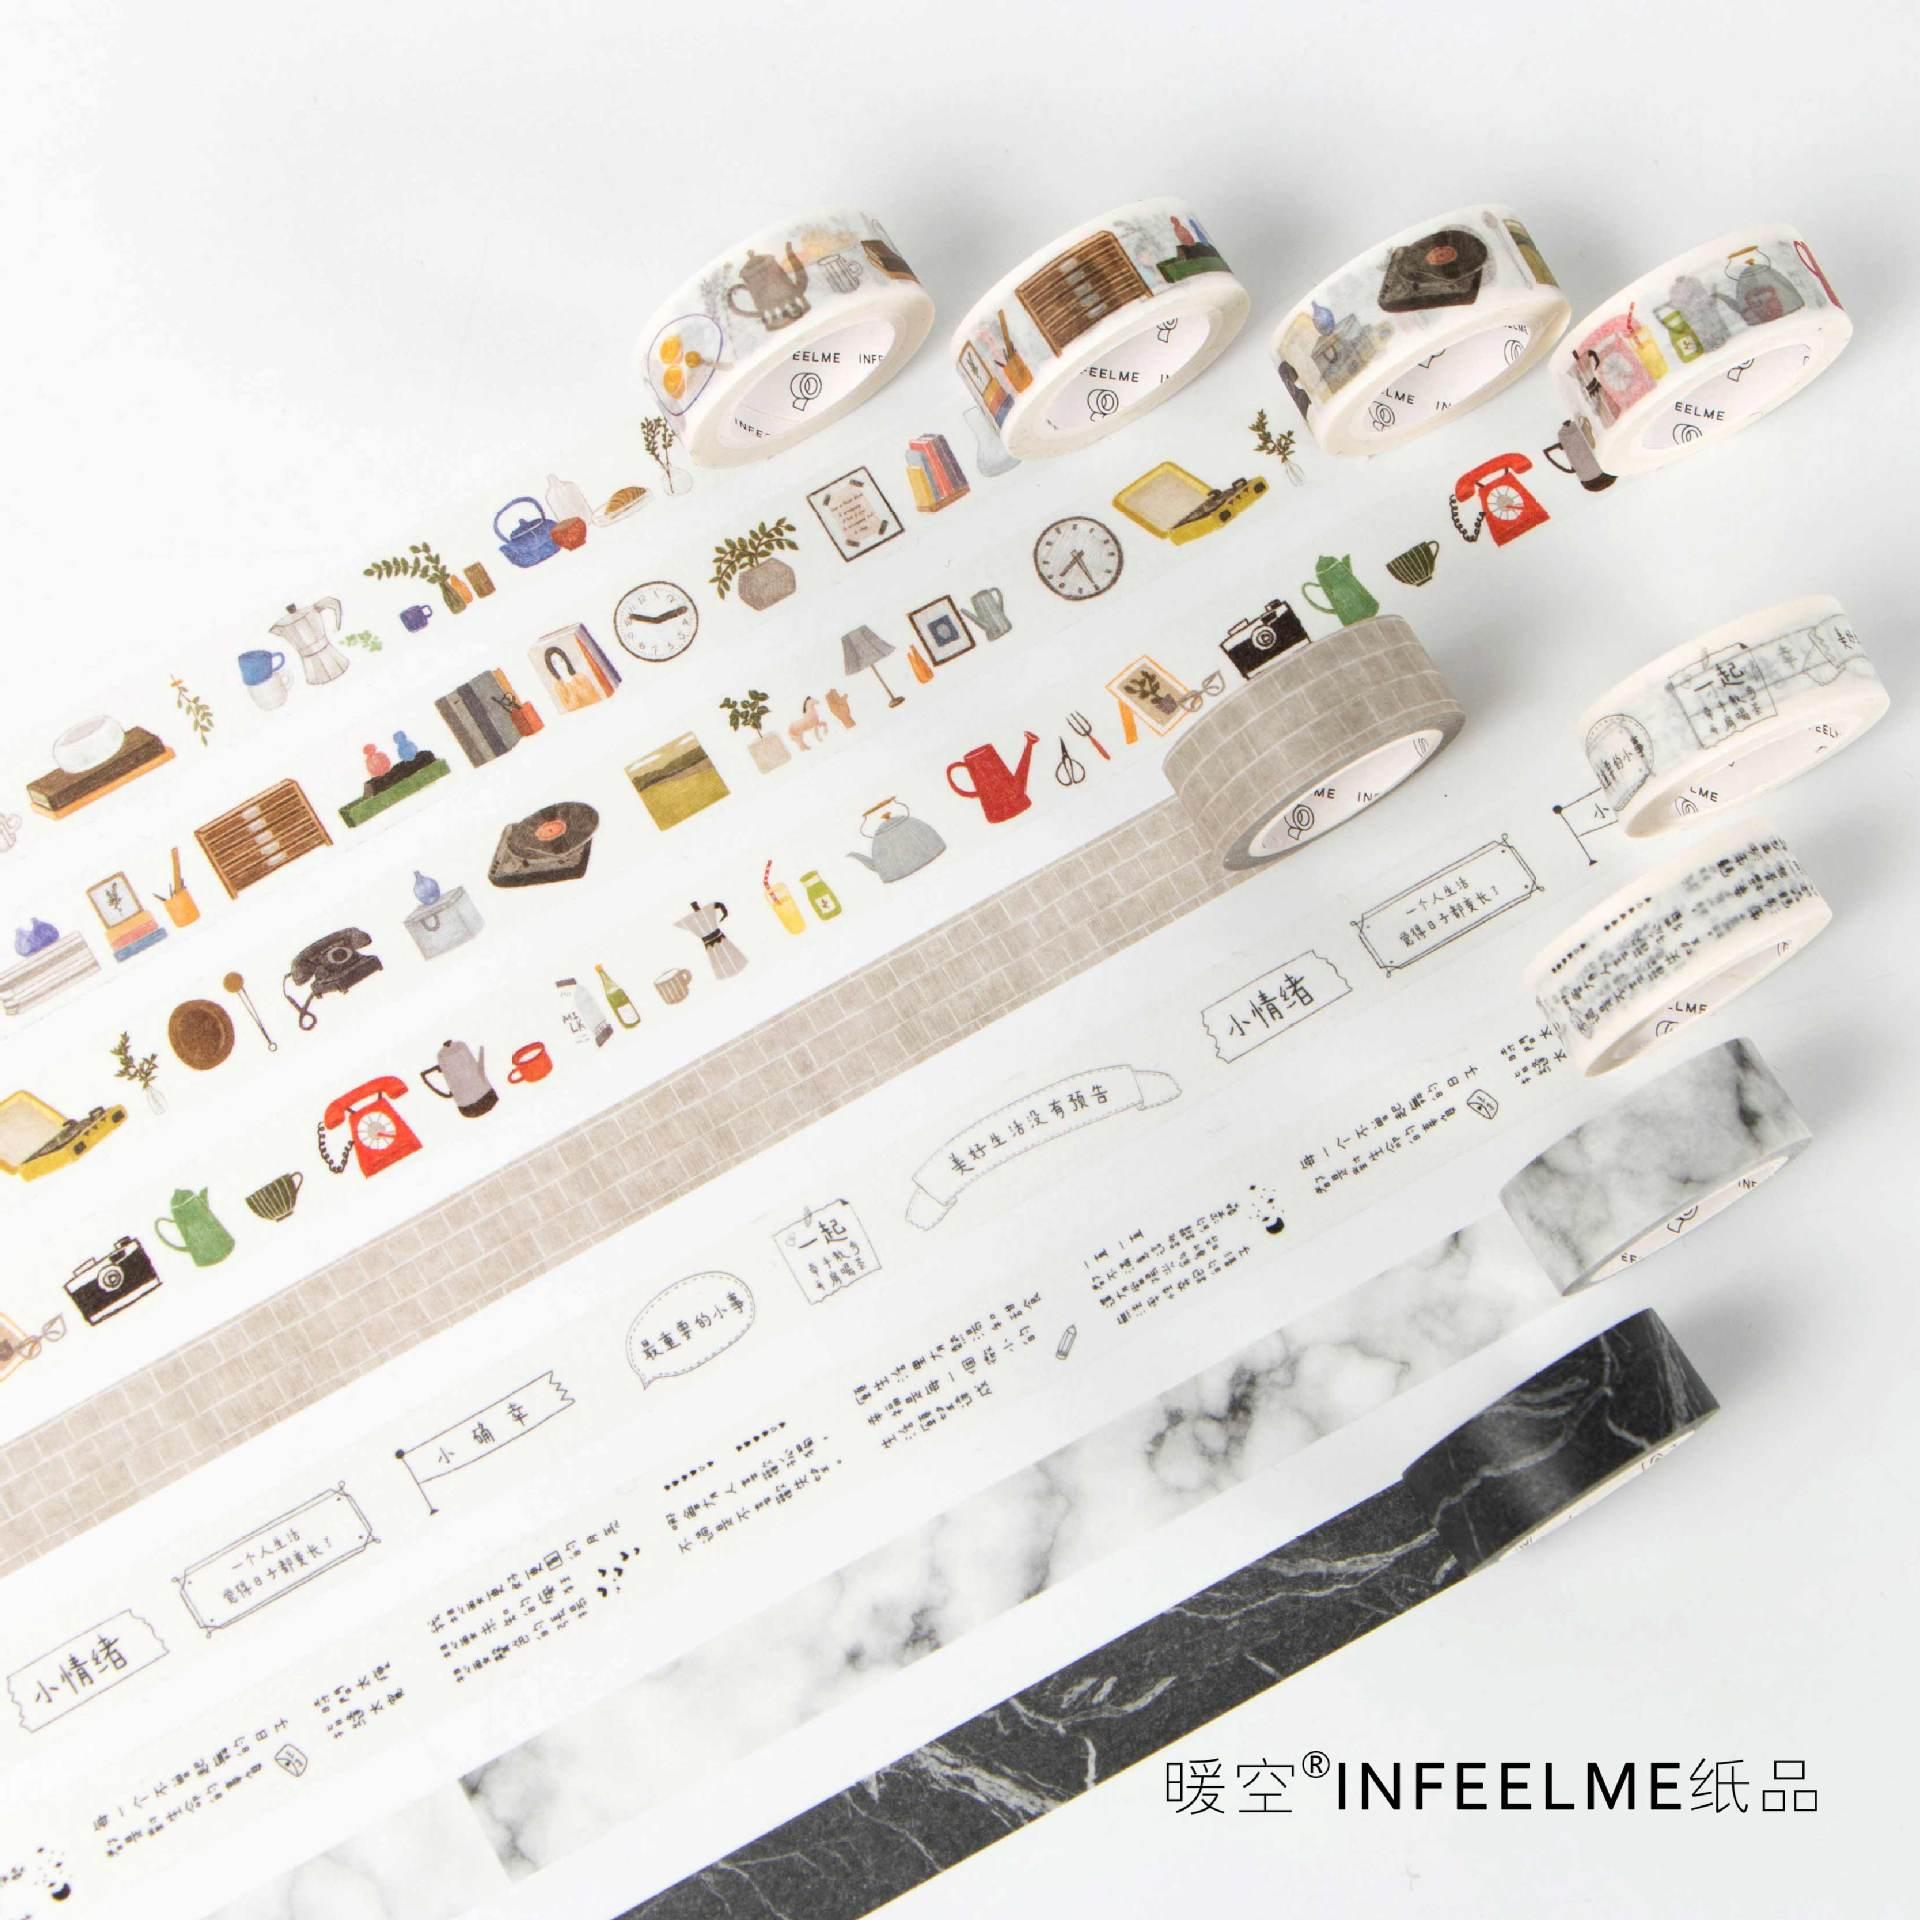 20 Pcs/lot DIY Japanese Paper Decorative Adhesive Tape Cartoon 100 Kinds Of Life Washi Tape/Masking Tape Stickers Size 15mm*7m